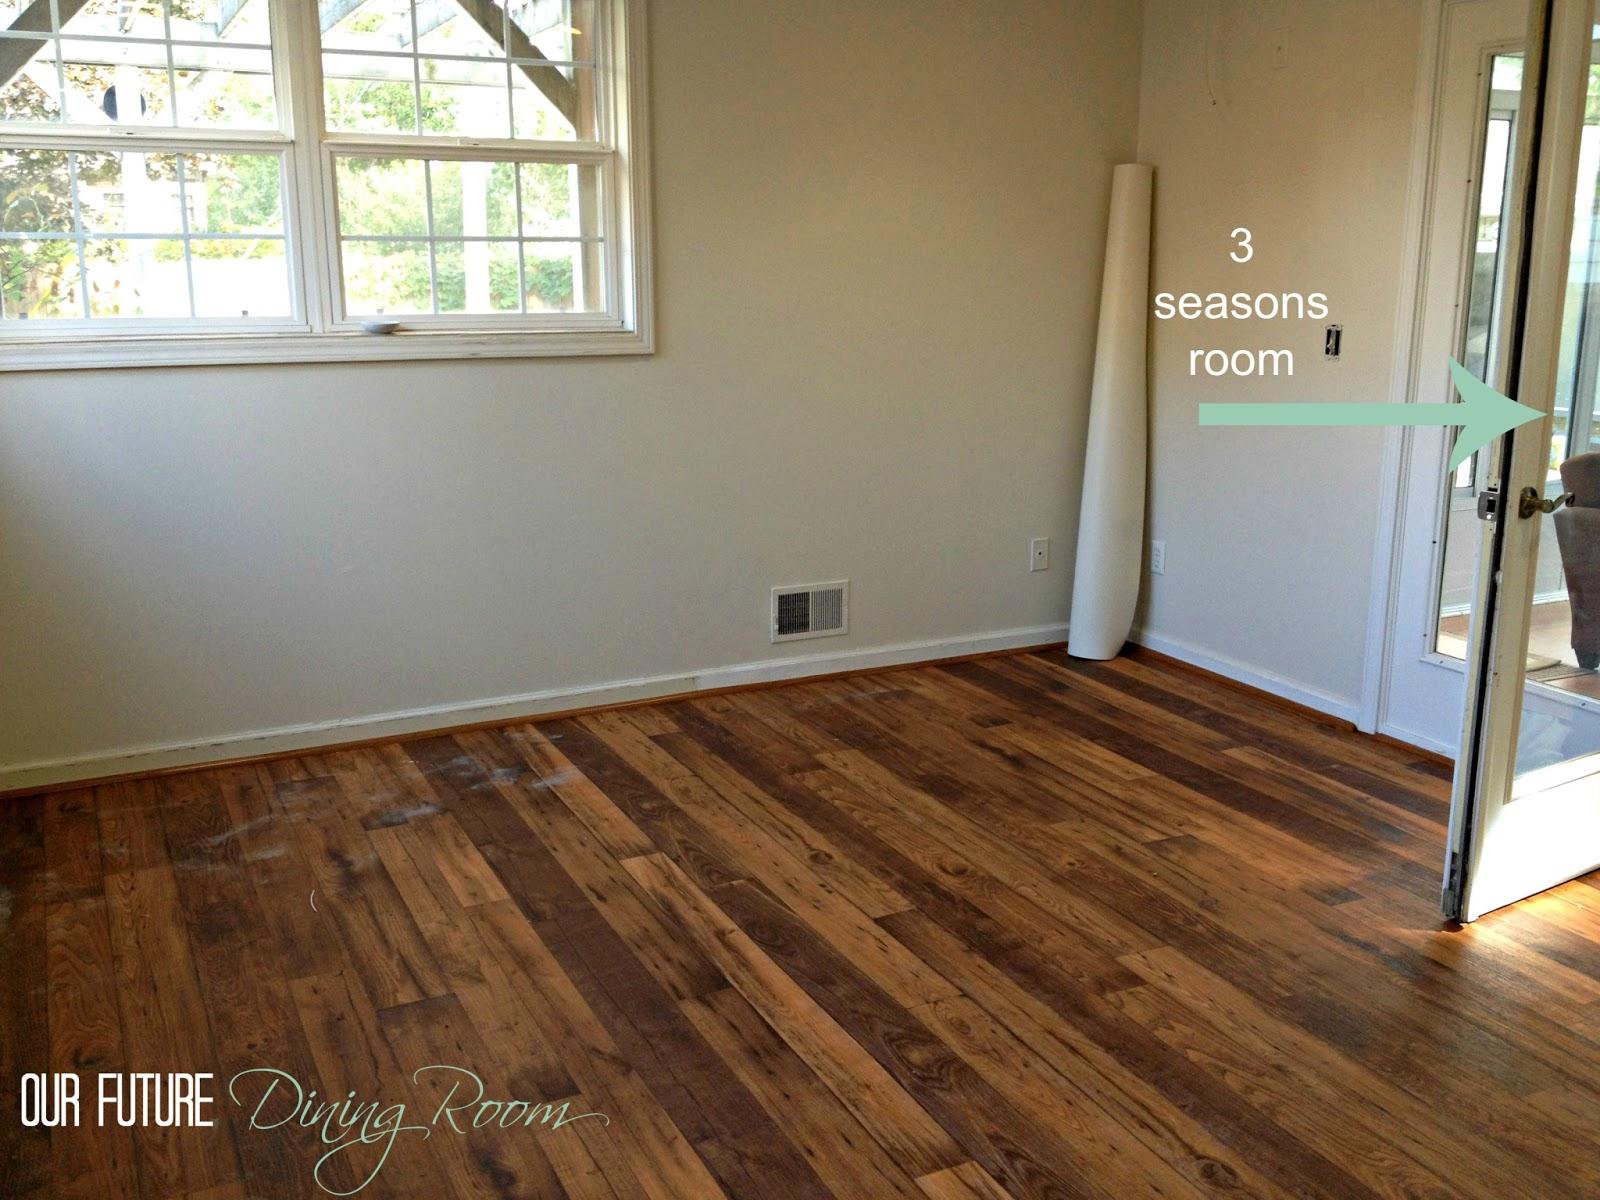 vinyl plank flooring. Black Bedroom Furniture Sets. Home Design Ideas